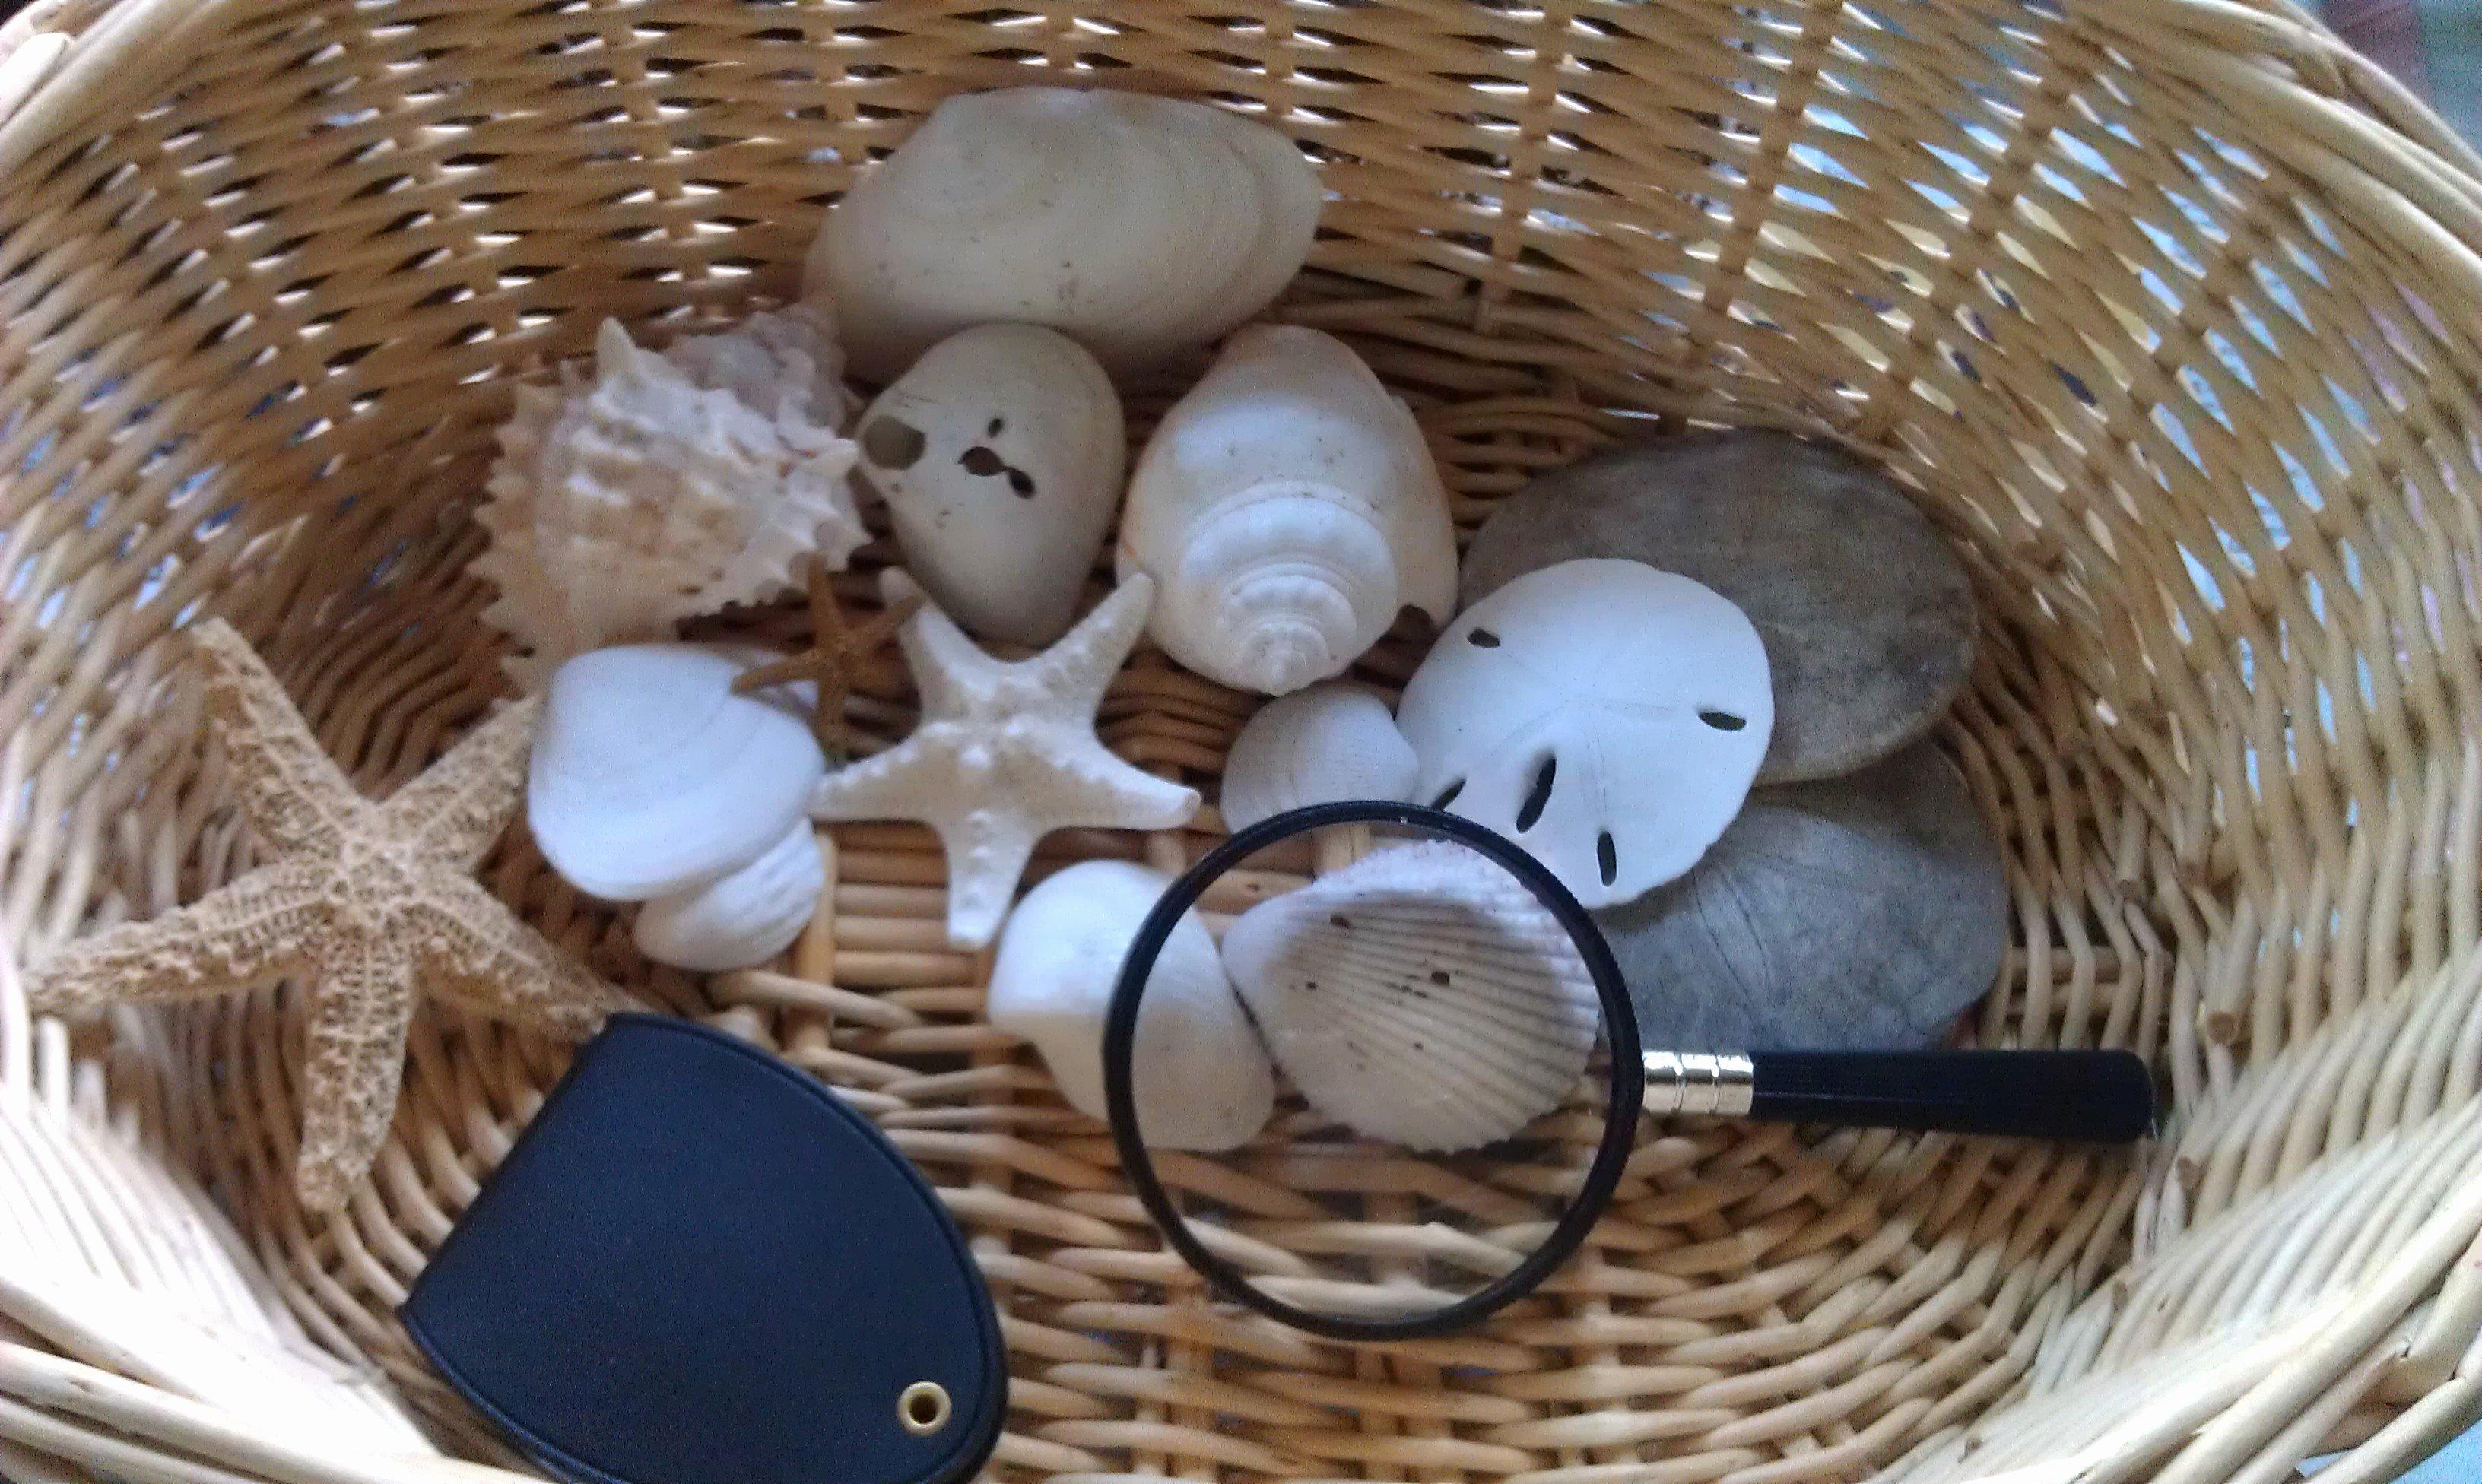 5 E's Lesson Plan Template Elegant Preschool Science Lesson Nature Observation Baskets Woo